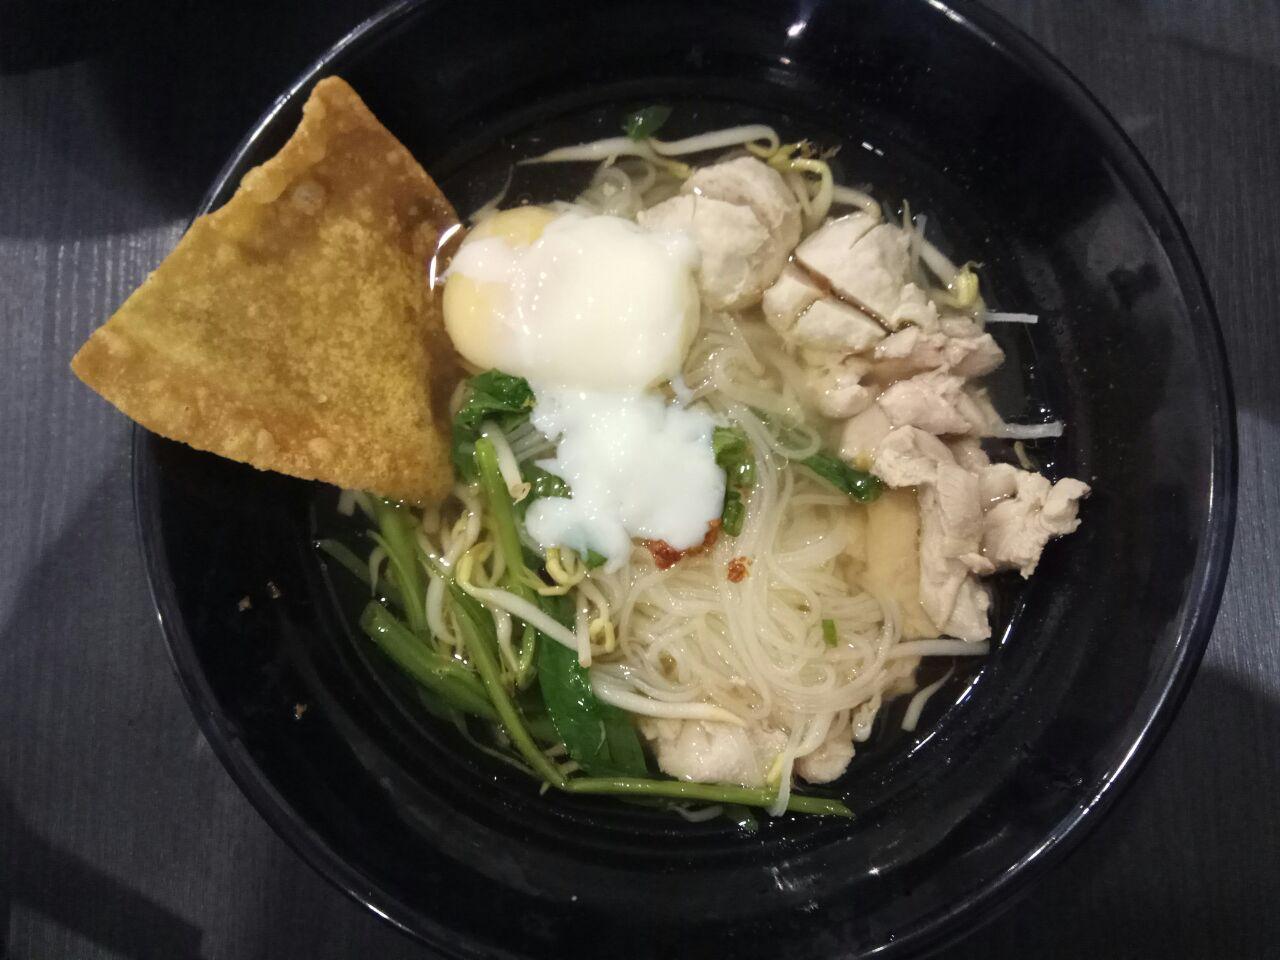 Spicy Noodle Soup 5.9nett